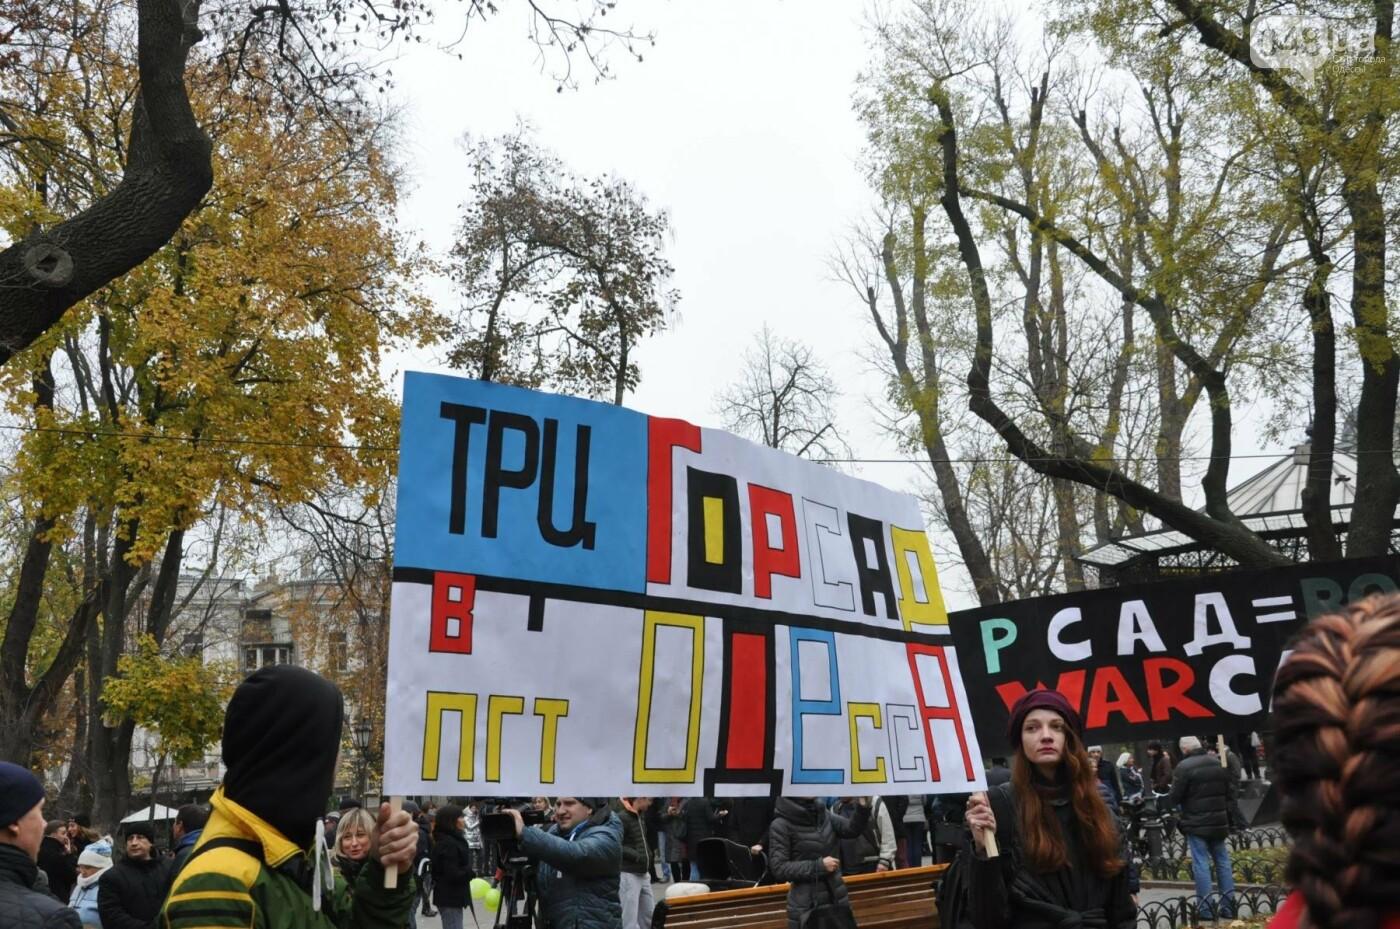 Около 5 сотен одесситов протестовали против застройки Горсада (ФОТО) , фото-29